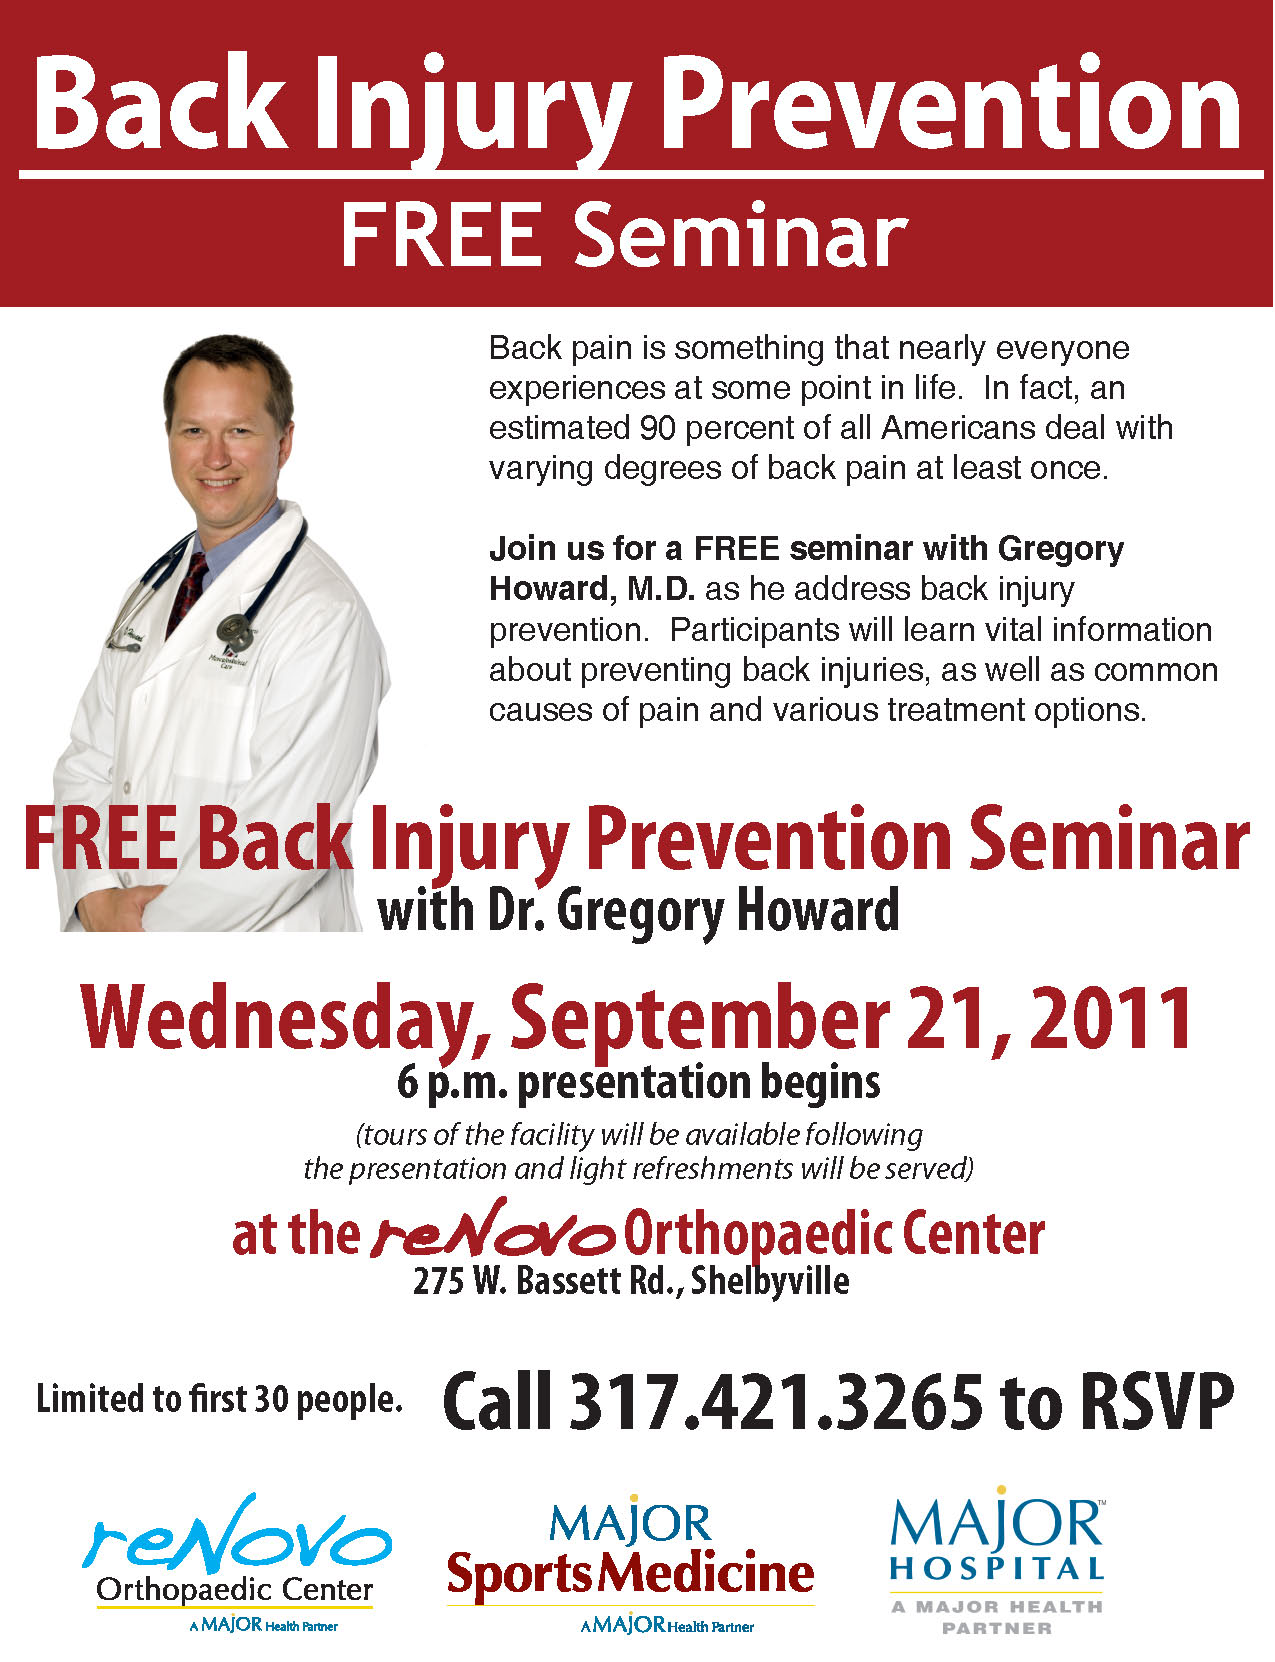 Back Injury Prevention Flyer